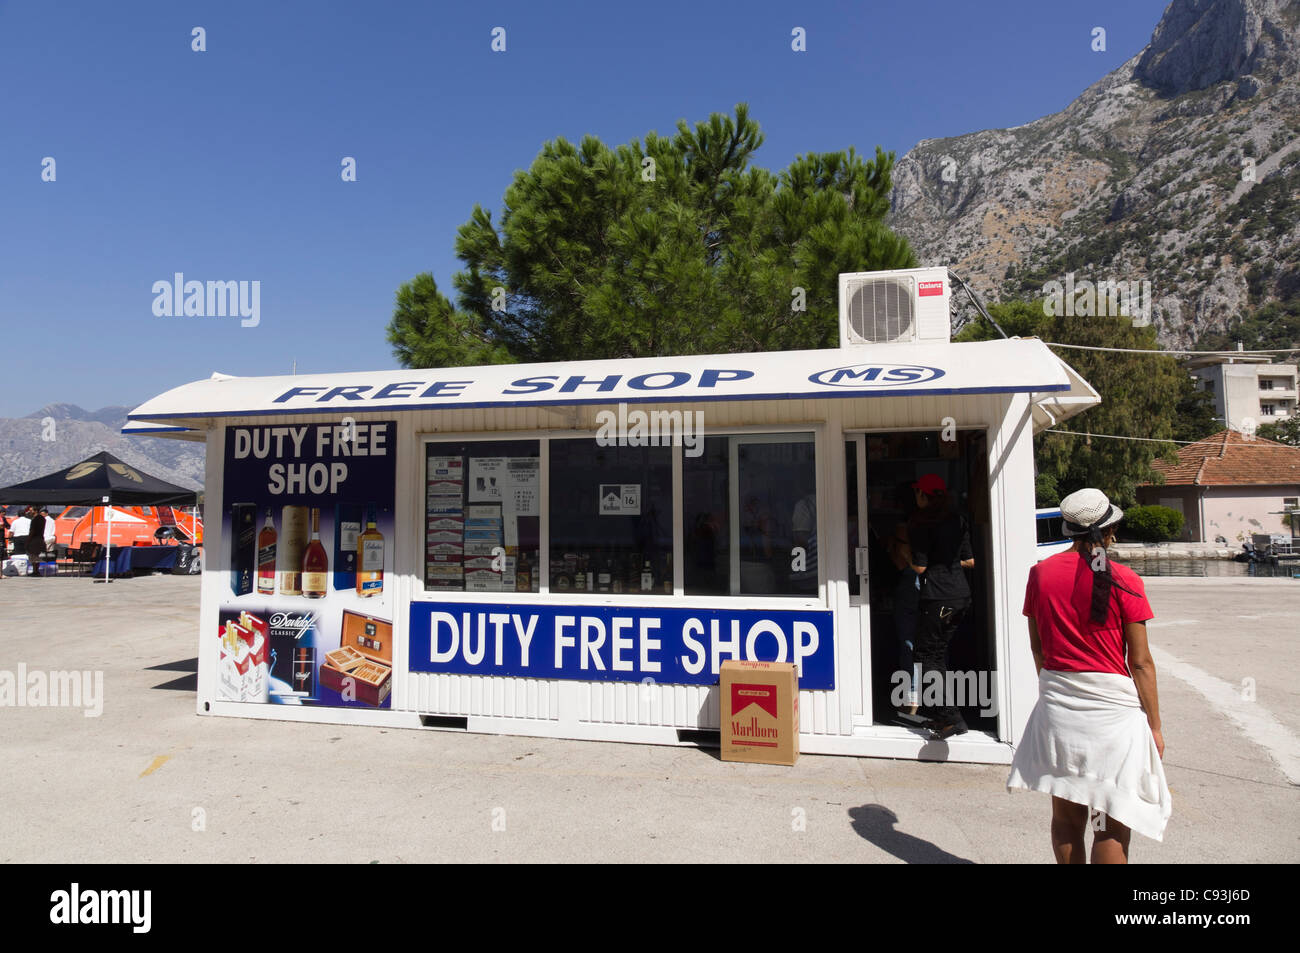 montenegro kotor the duty free shop stock photo 40032789 alamy